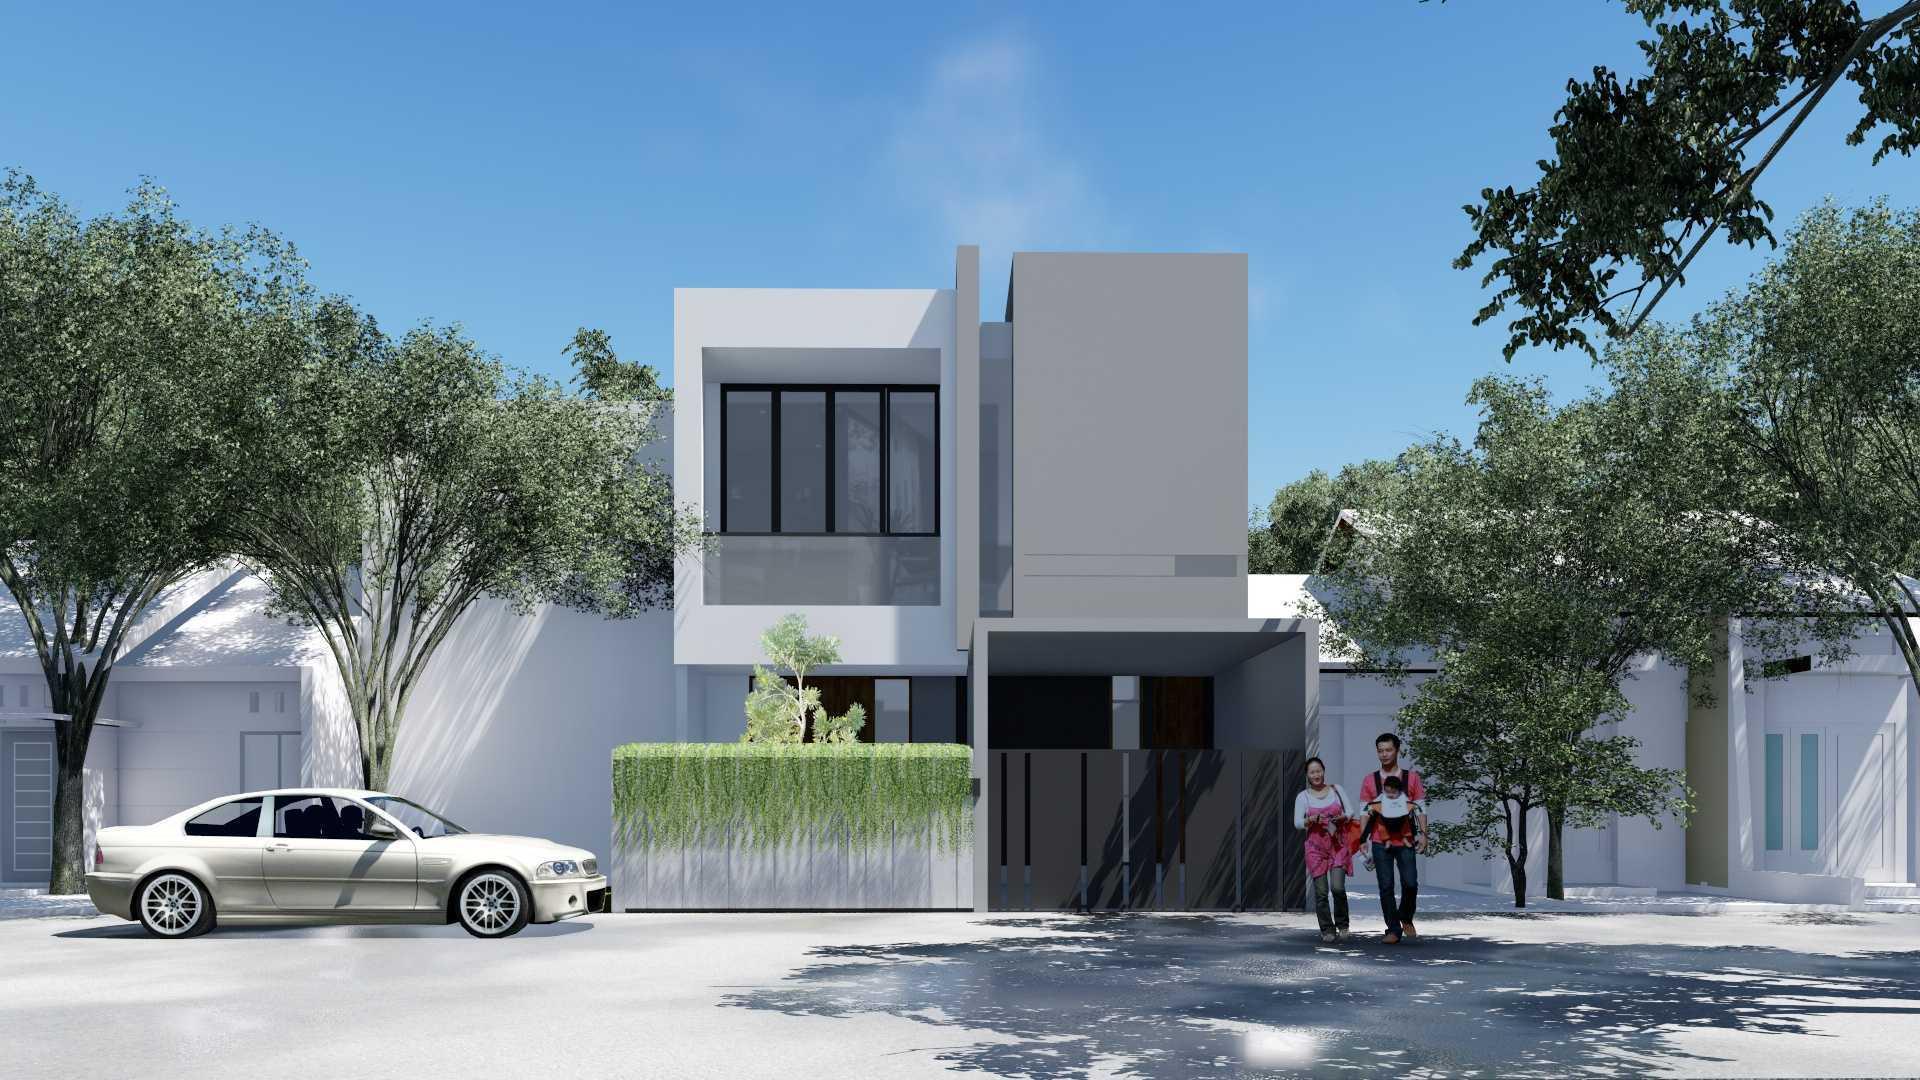 Adefa Studio Rh House Bekasi Tim., Kota Bks, Jawa Barat, Indonesia Bekasi Tim., Kota Bks, Jawa Barat, Indonesia Rh House - Front View Contemporary  45531